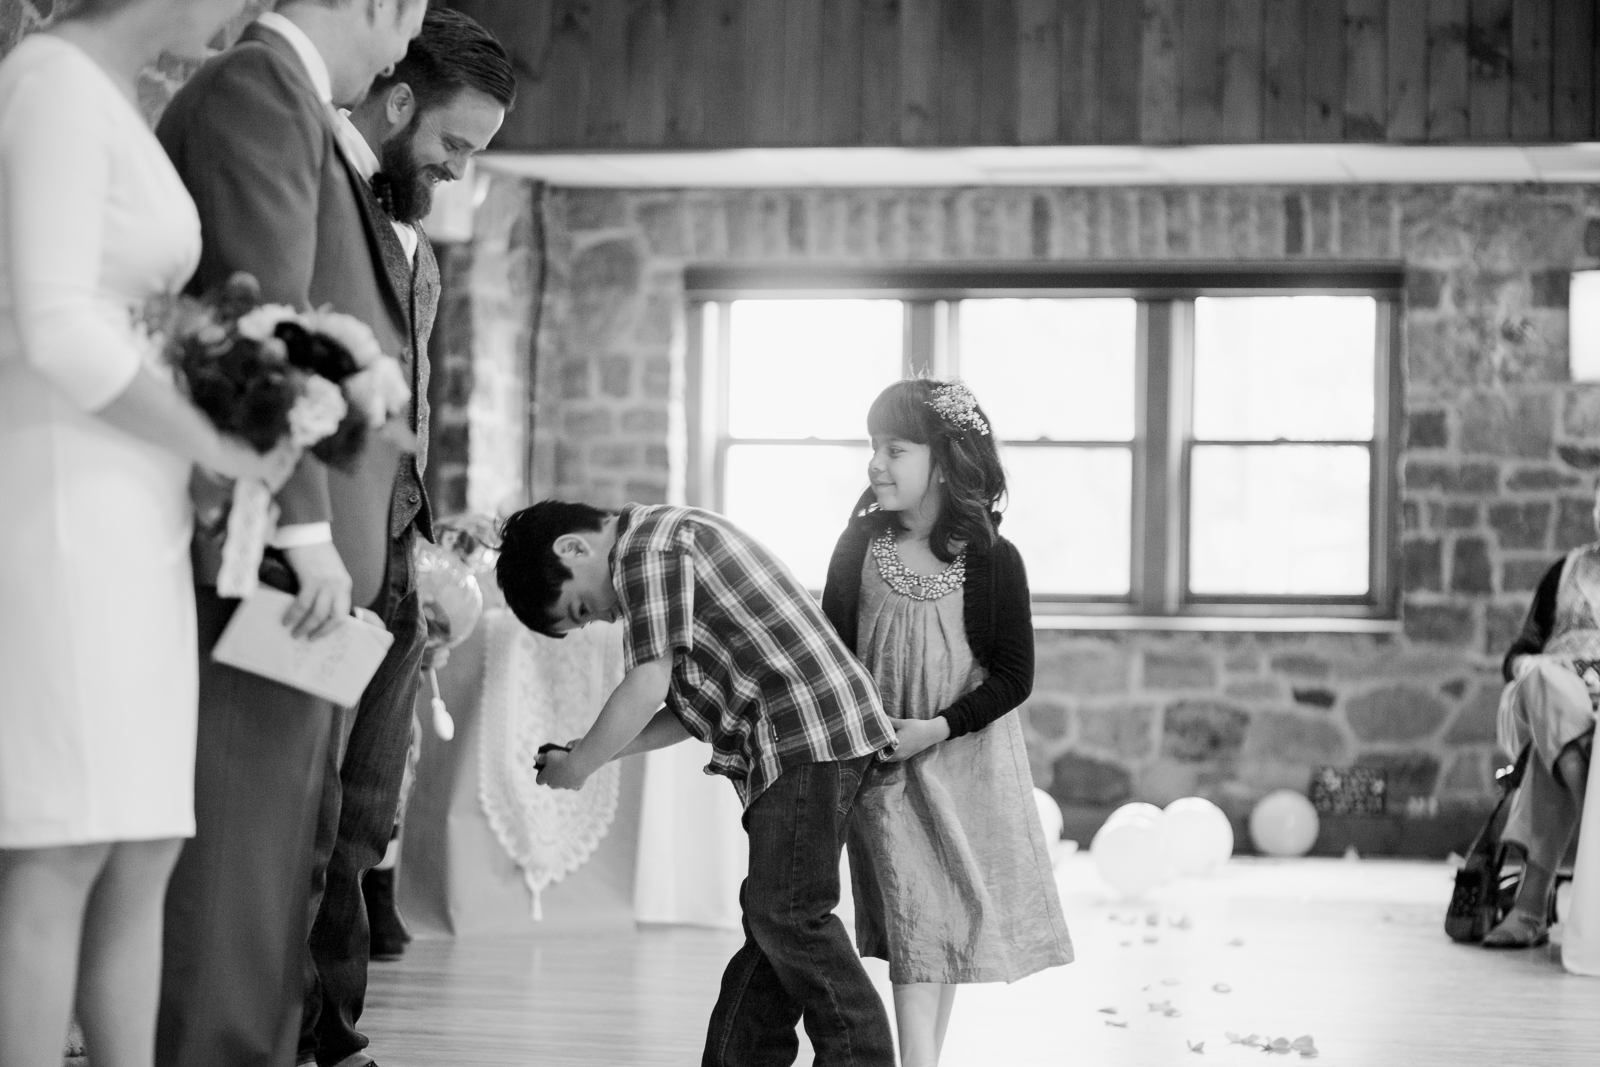 sepandstellwiconsinwedding-21.jpg